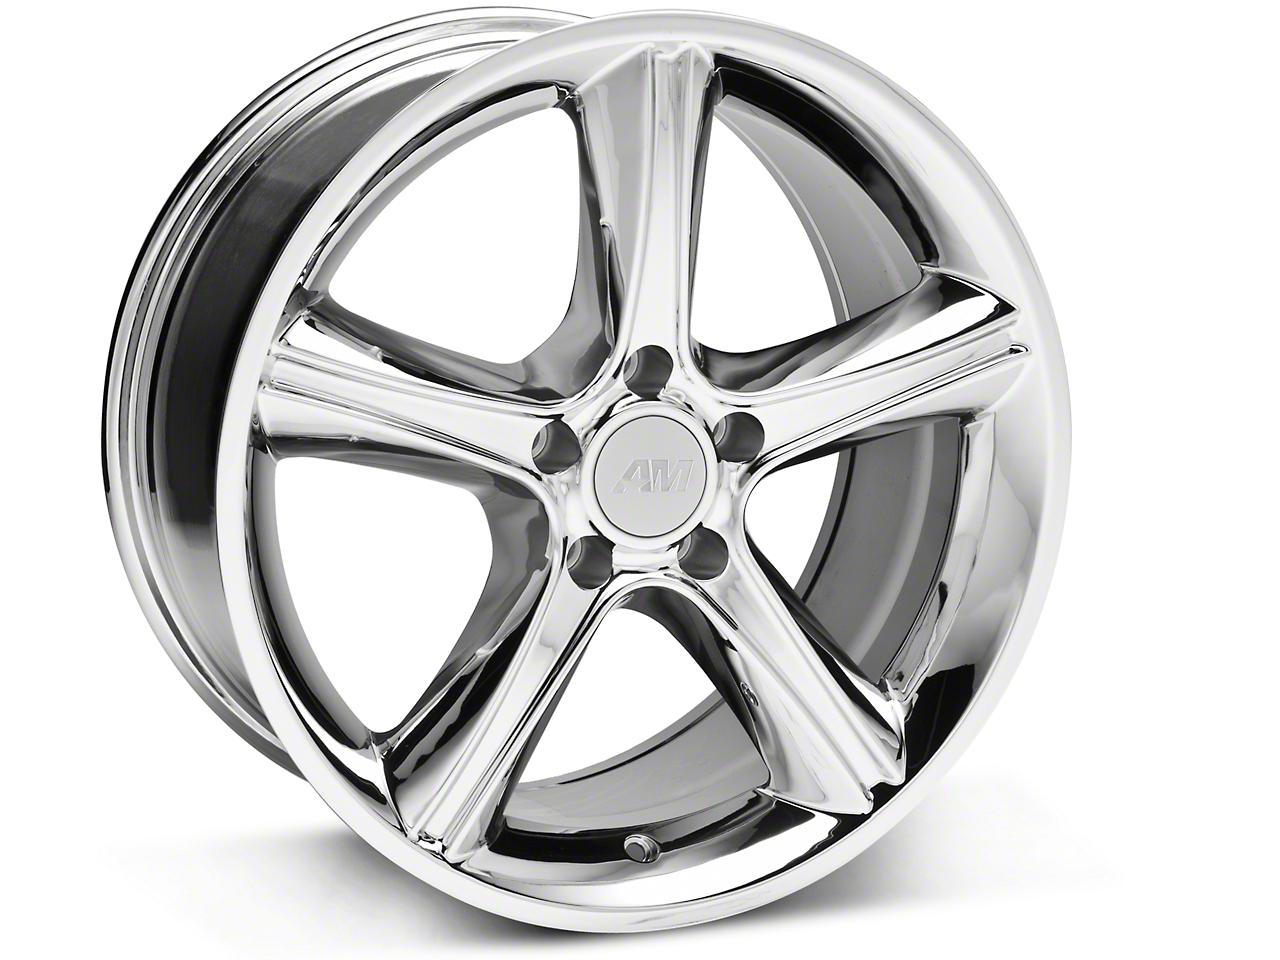 2010 GT Premium Style Chrome Wheel - 18x9 (87-93 5 Lug Conversion)